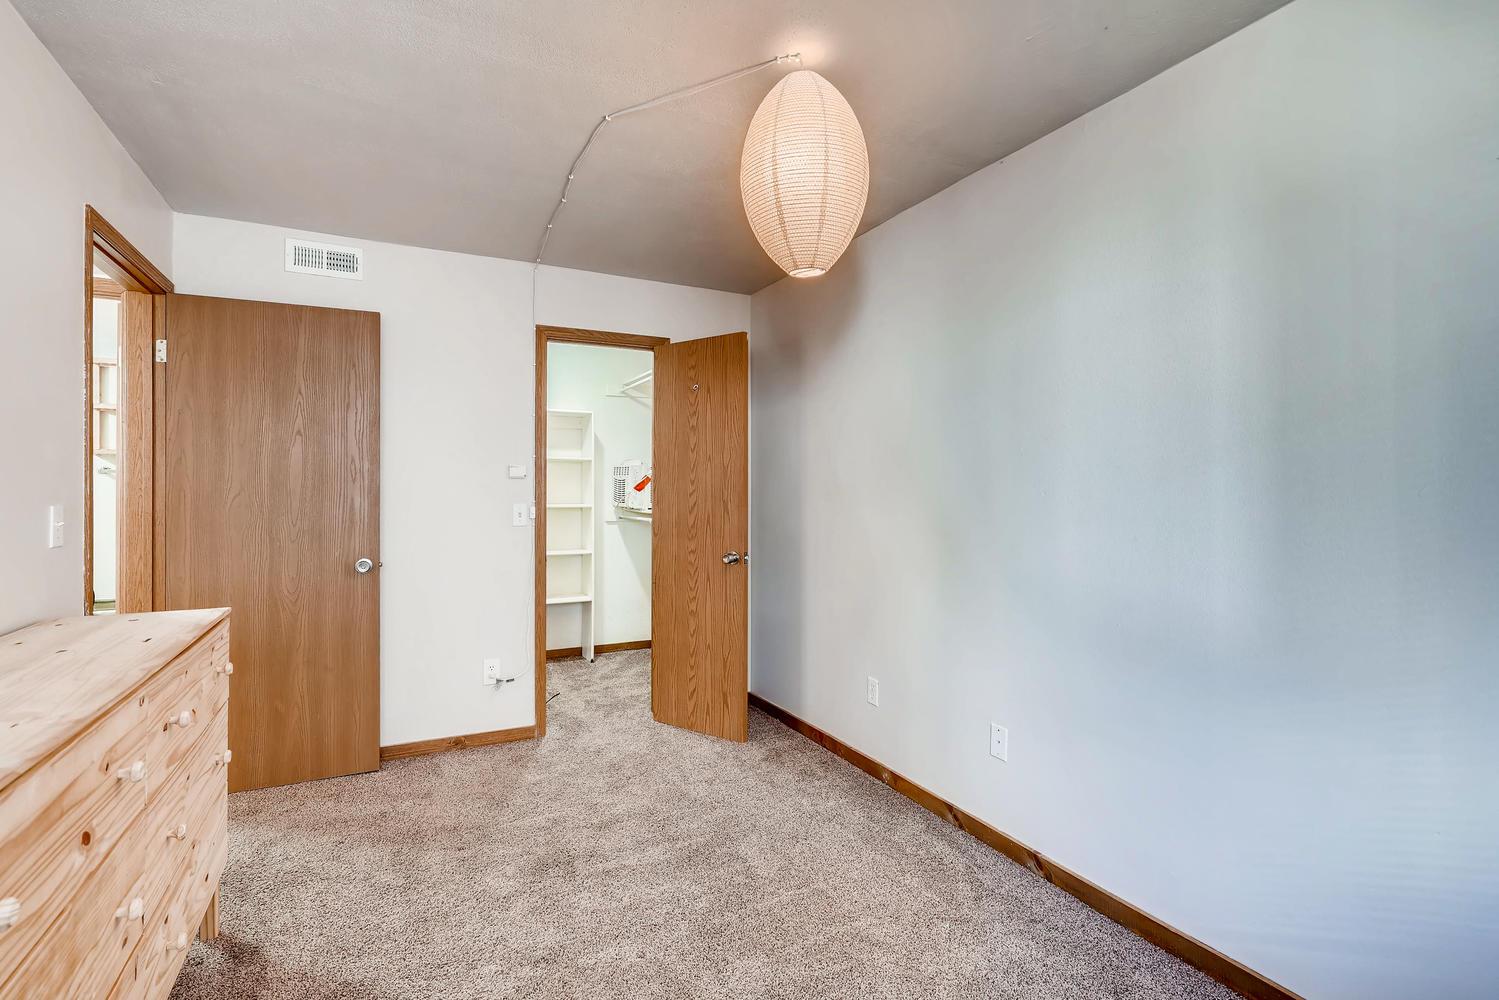 12478 W Nevada Pl 104 Lakewood-large-018-019-Master Bedroom-1500x1000-72dpi.jpg